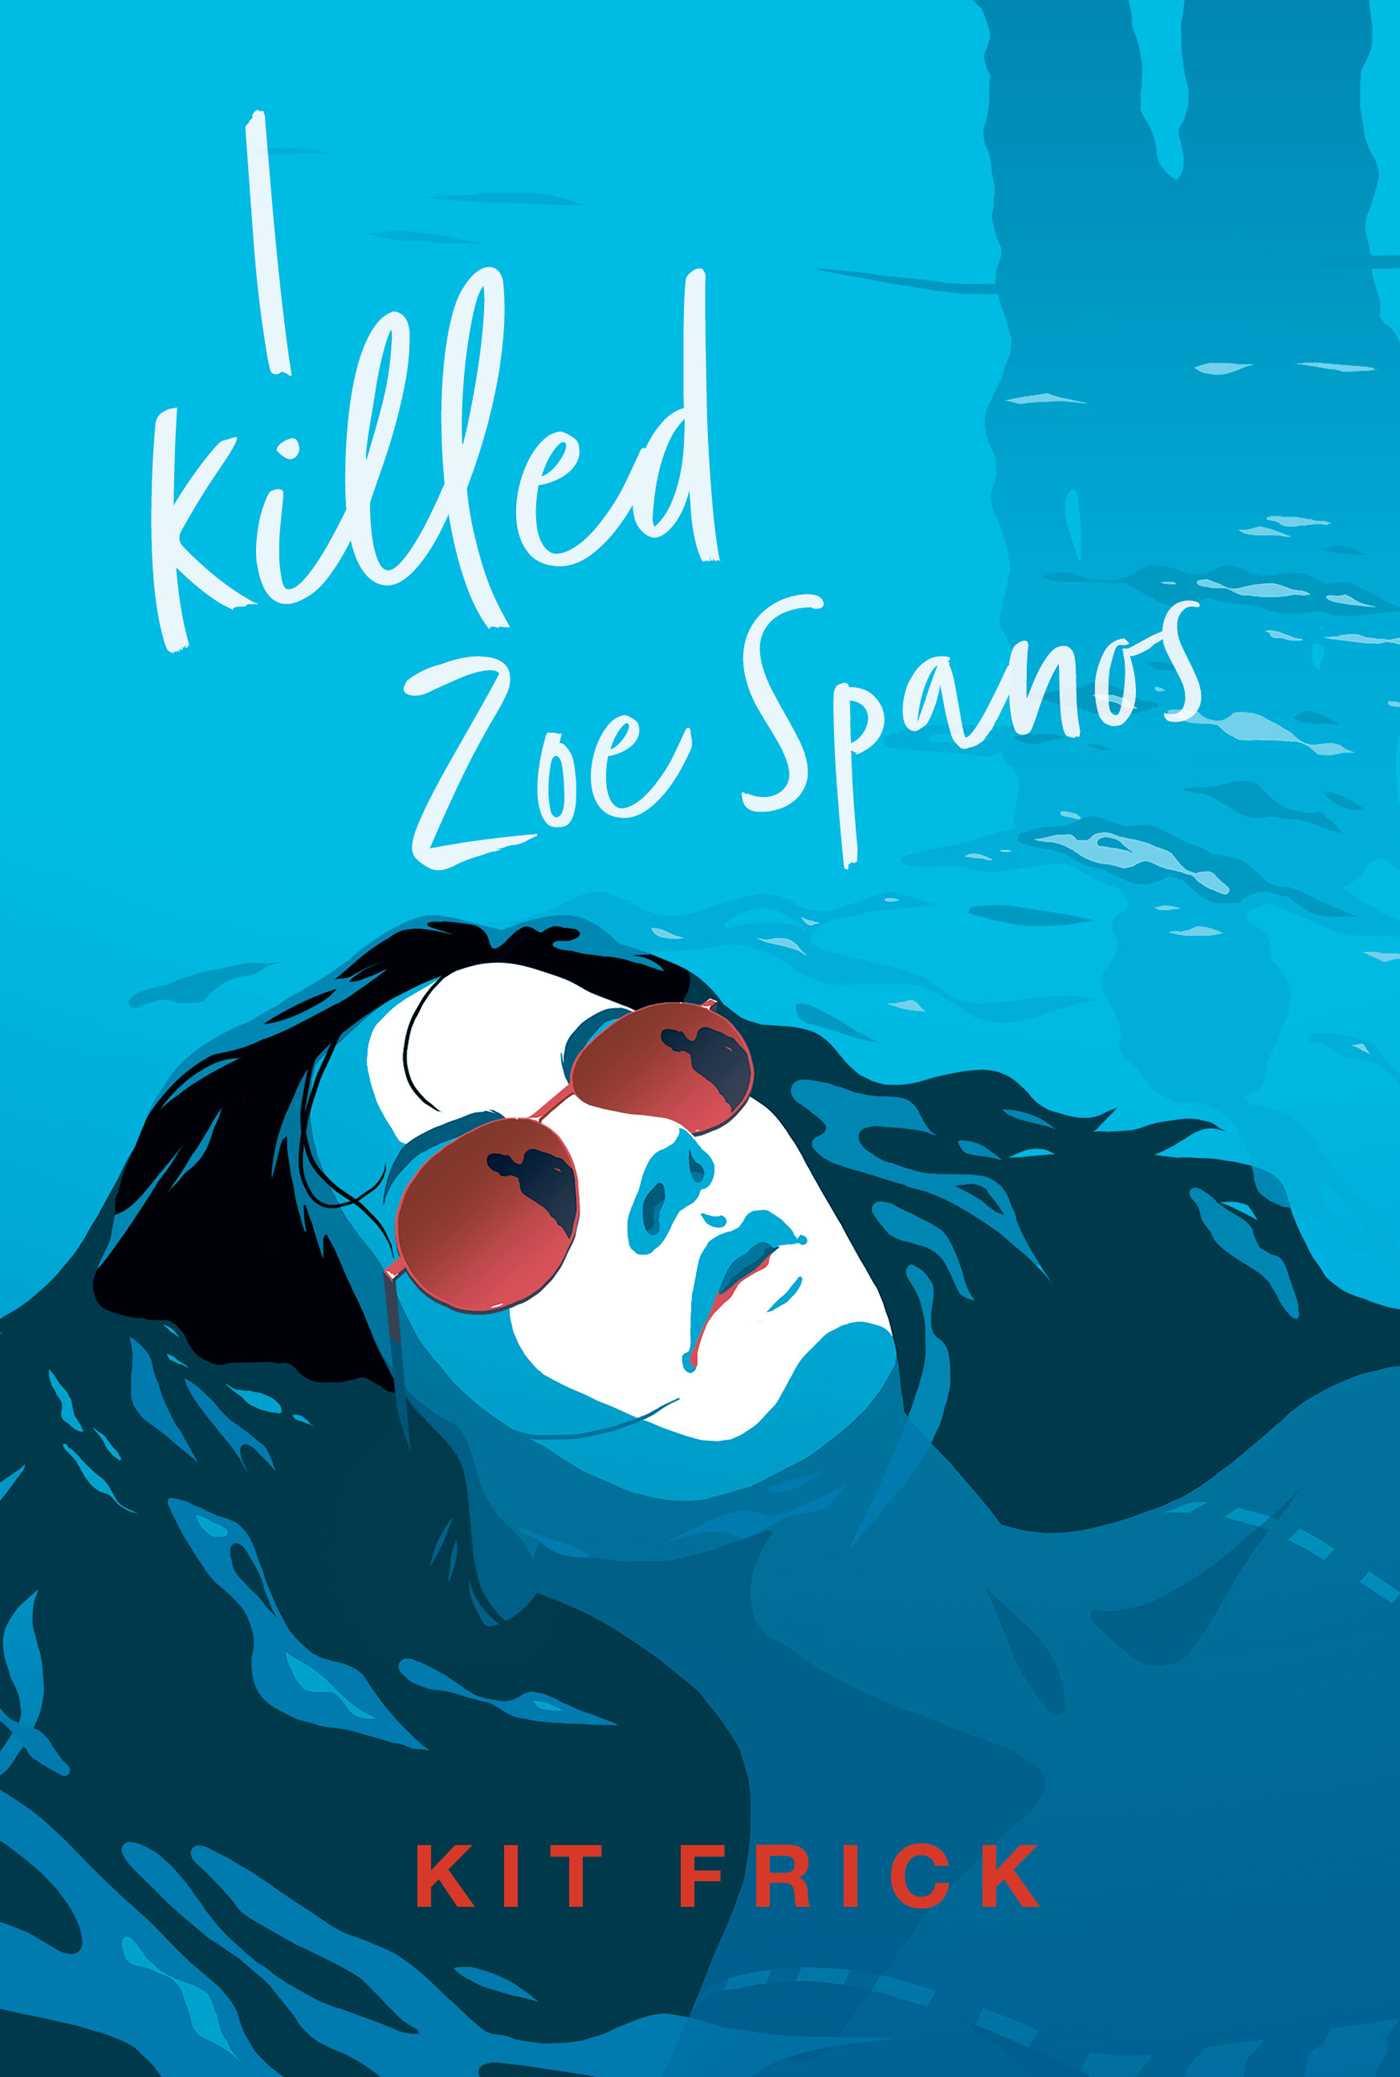 i illed zoe spanos book cover